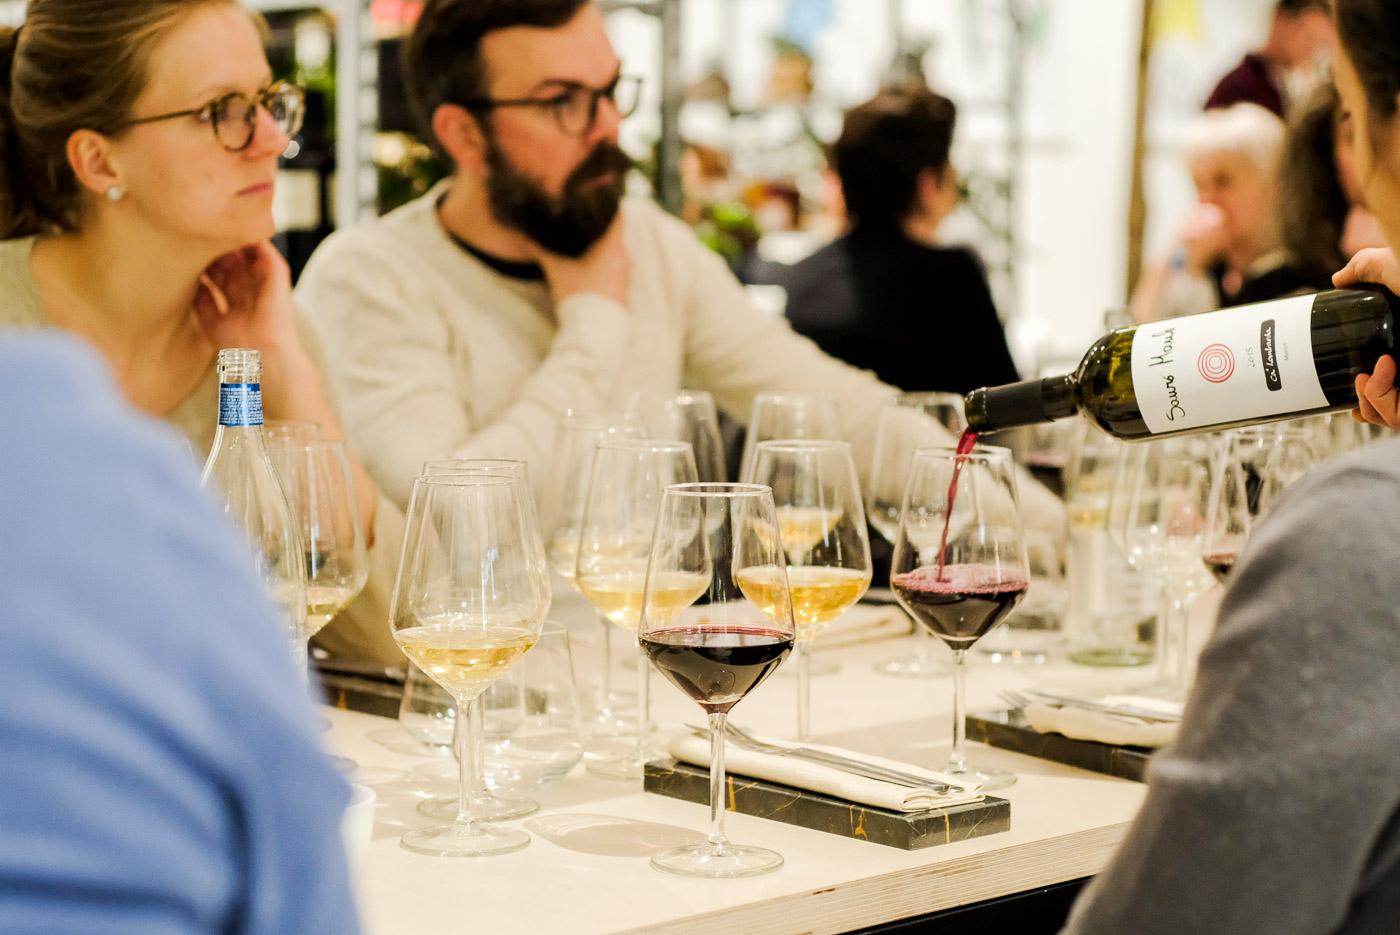 040-Degustazione-Elementary-vino-naturale-_XPR3952_p_LR_web-1